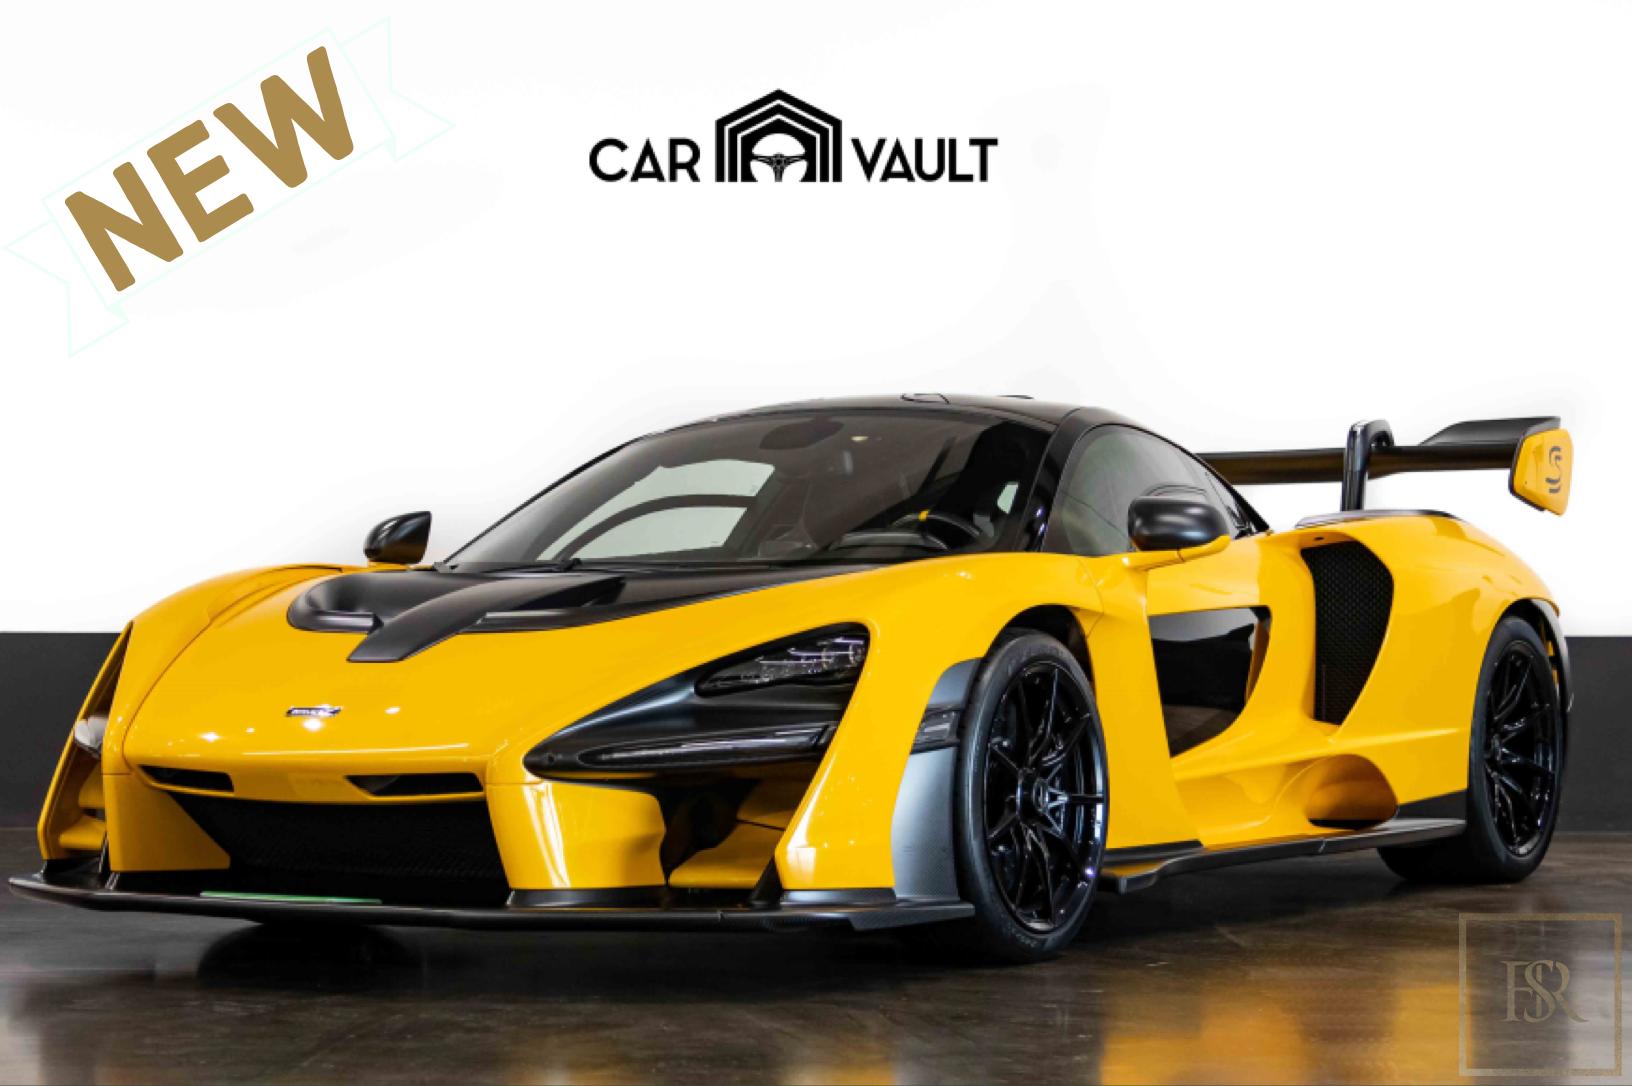 2019 McLaren Senna for sale For Super Rich